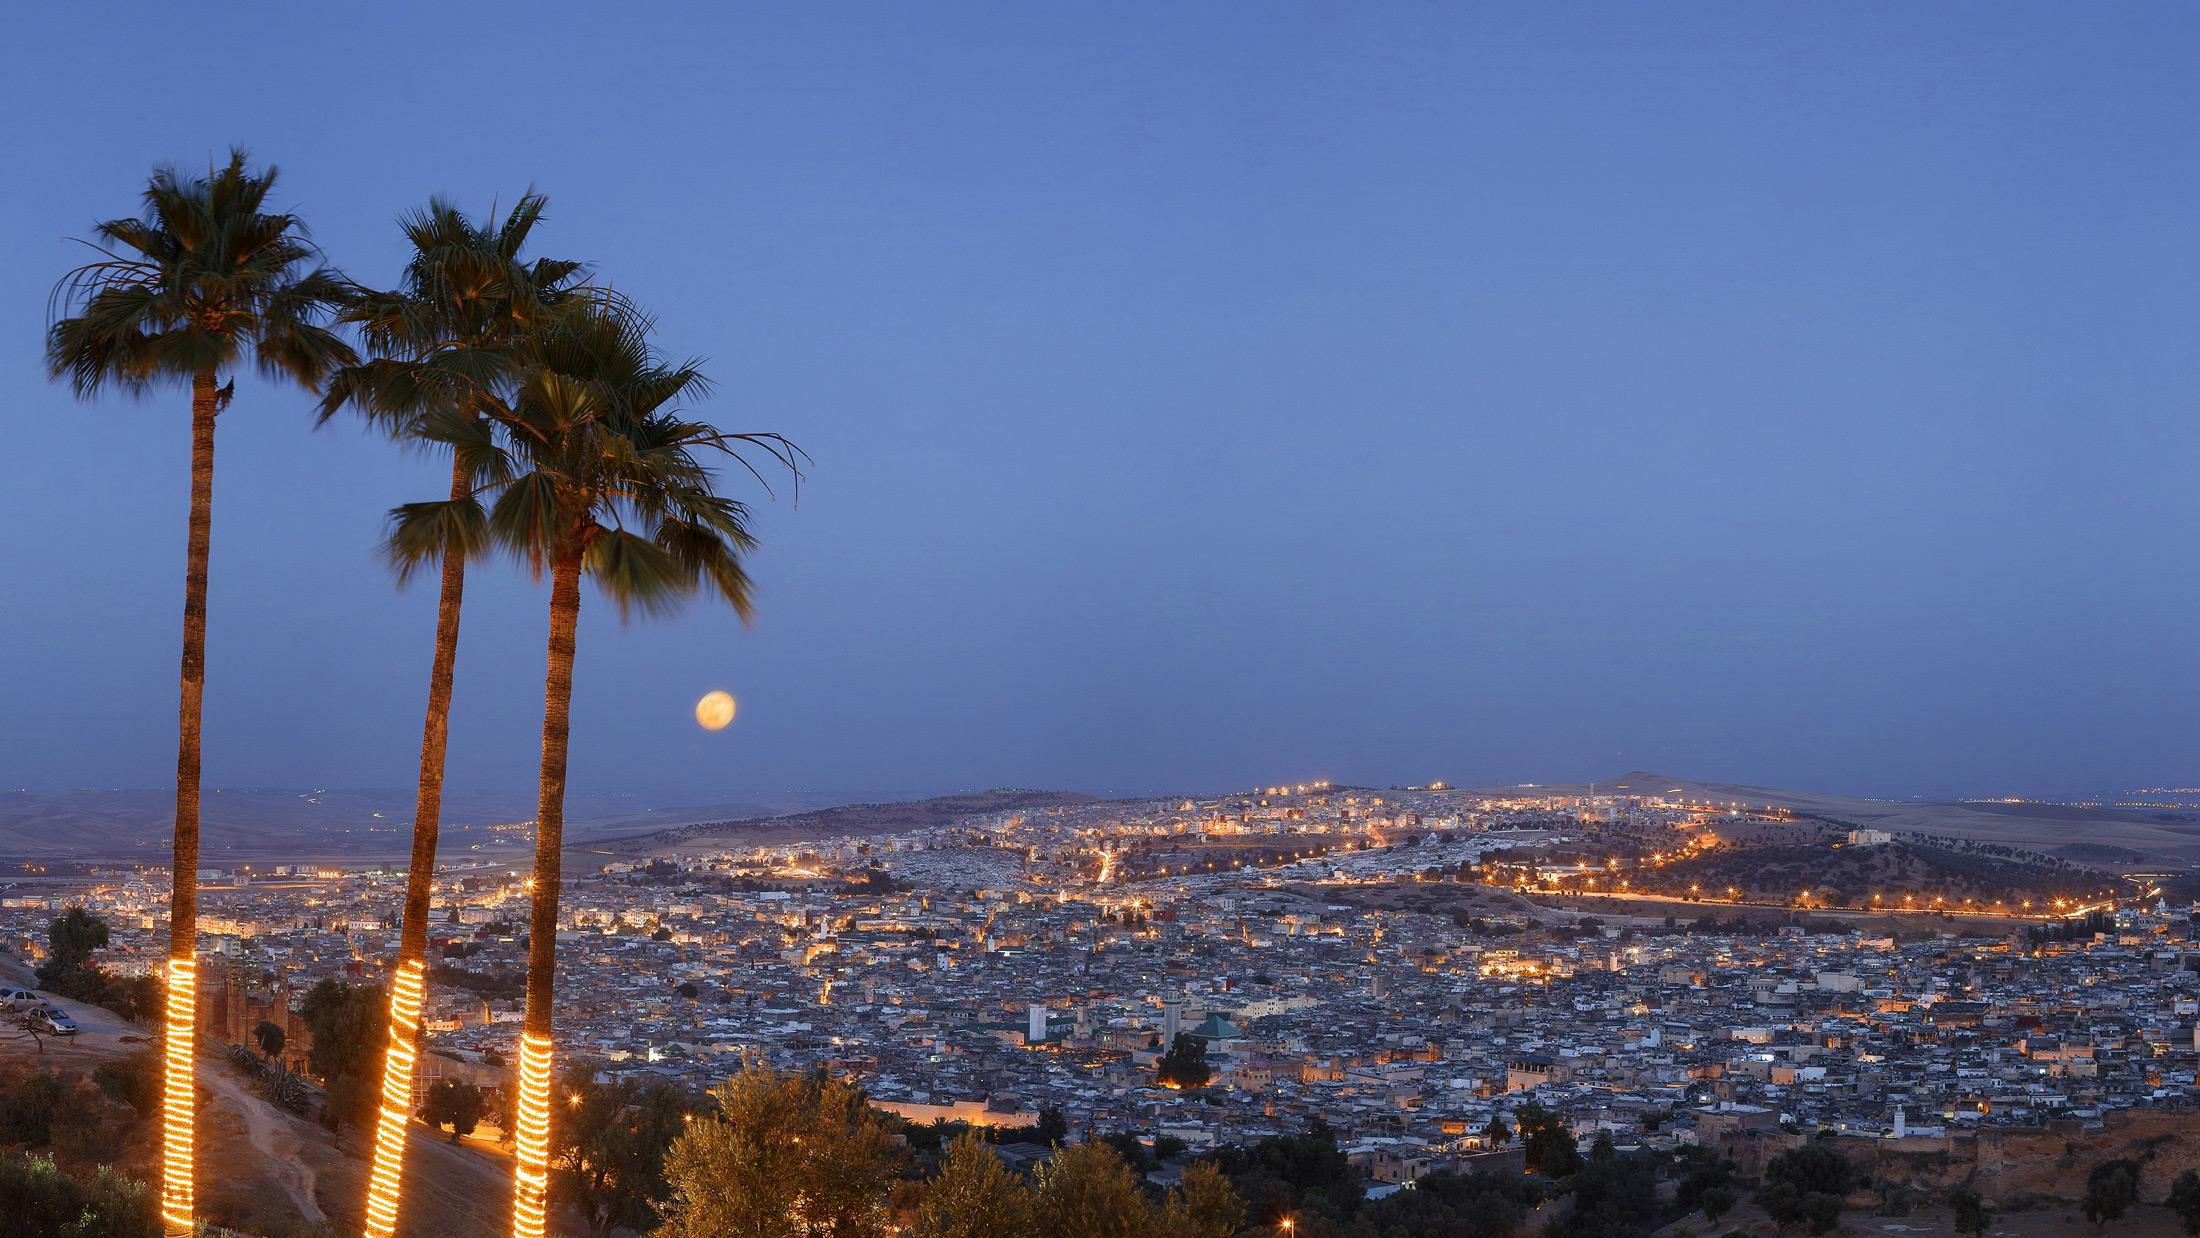 The Royal Palace of Fez (image Luiz Davilla Getty images)